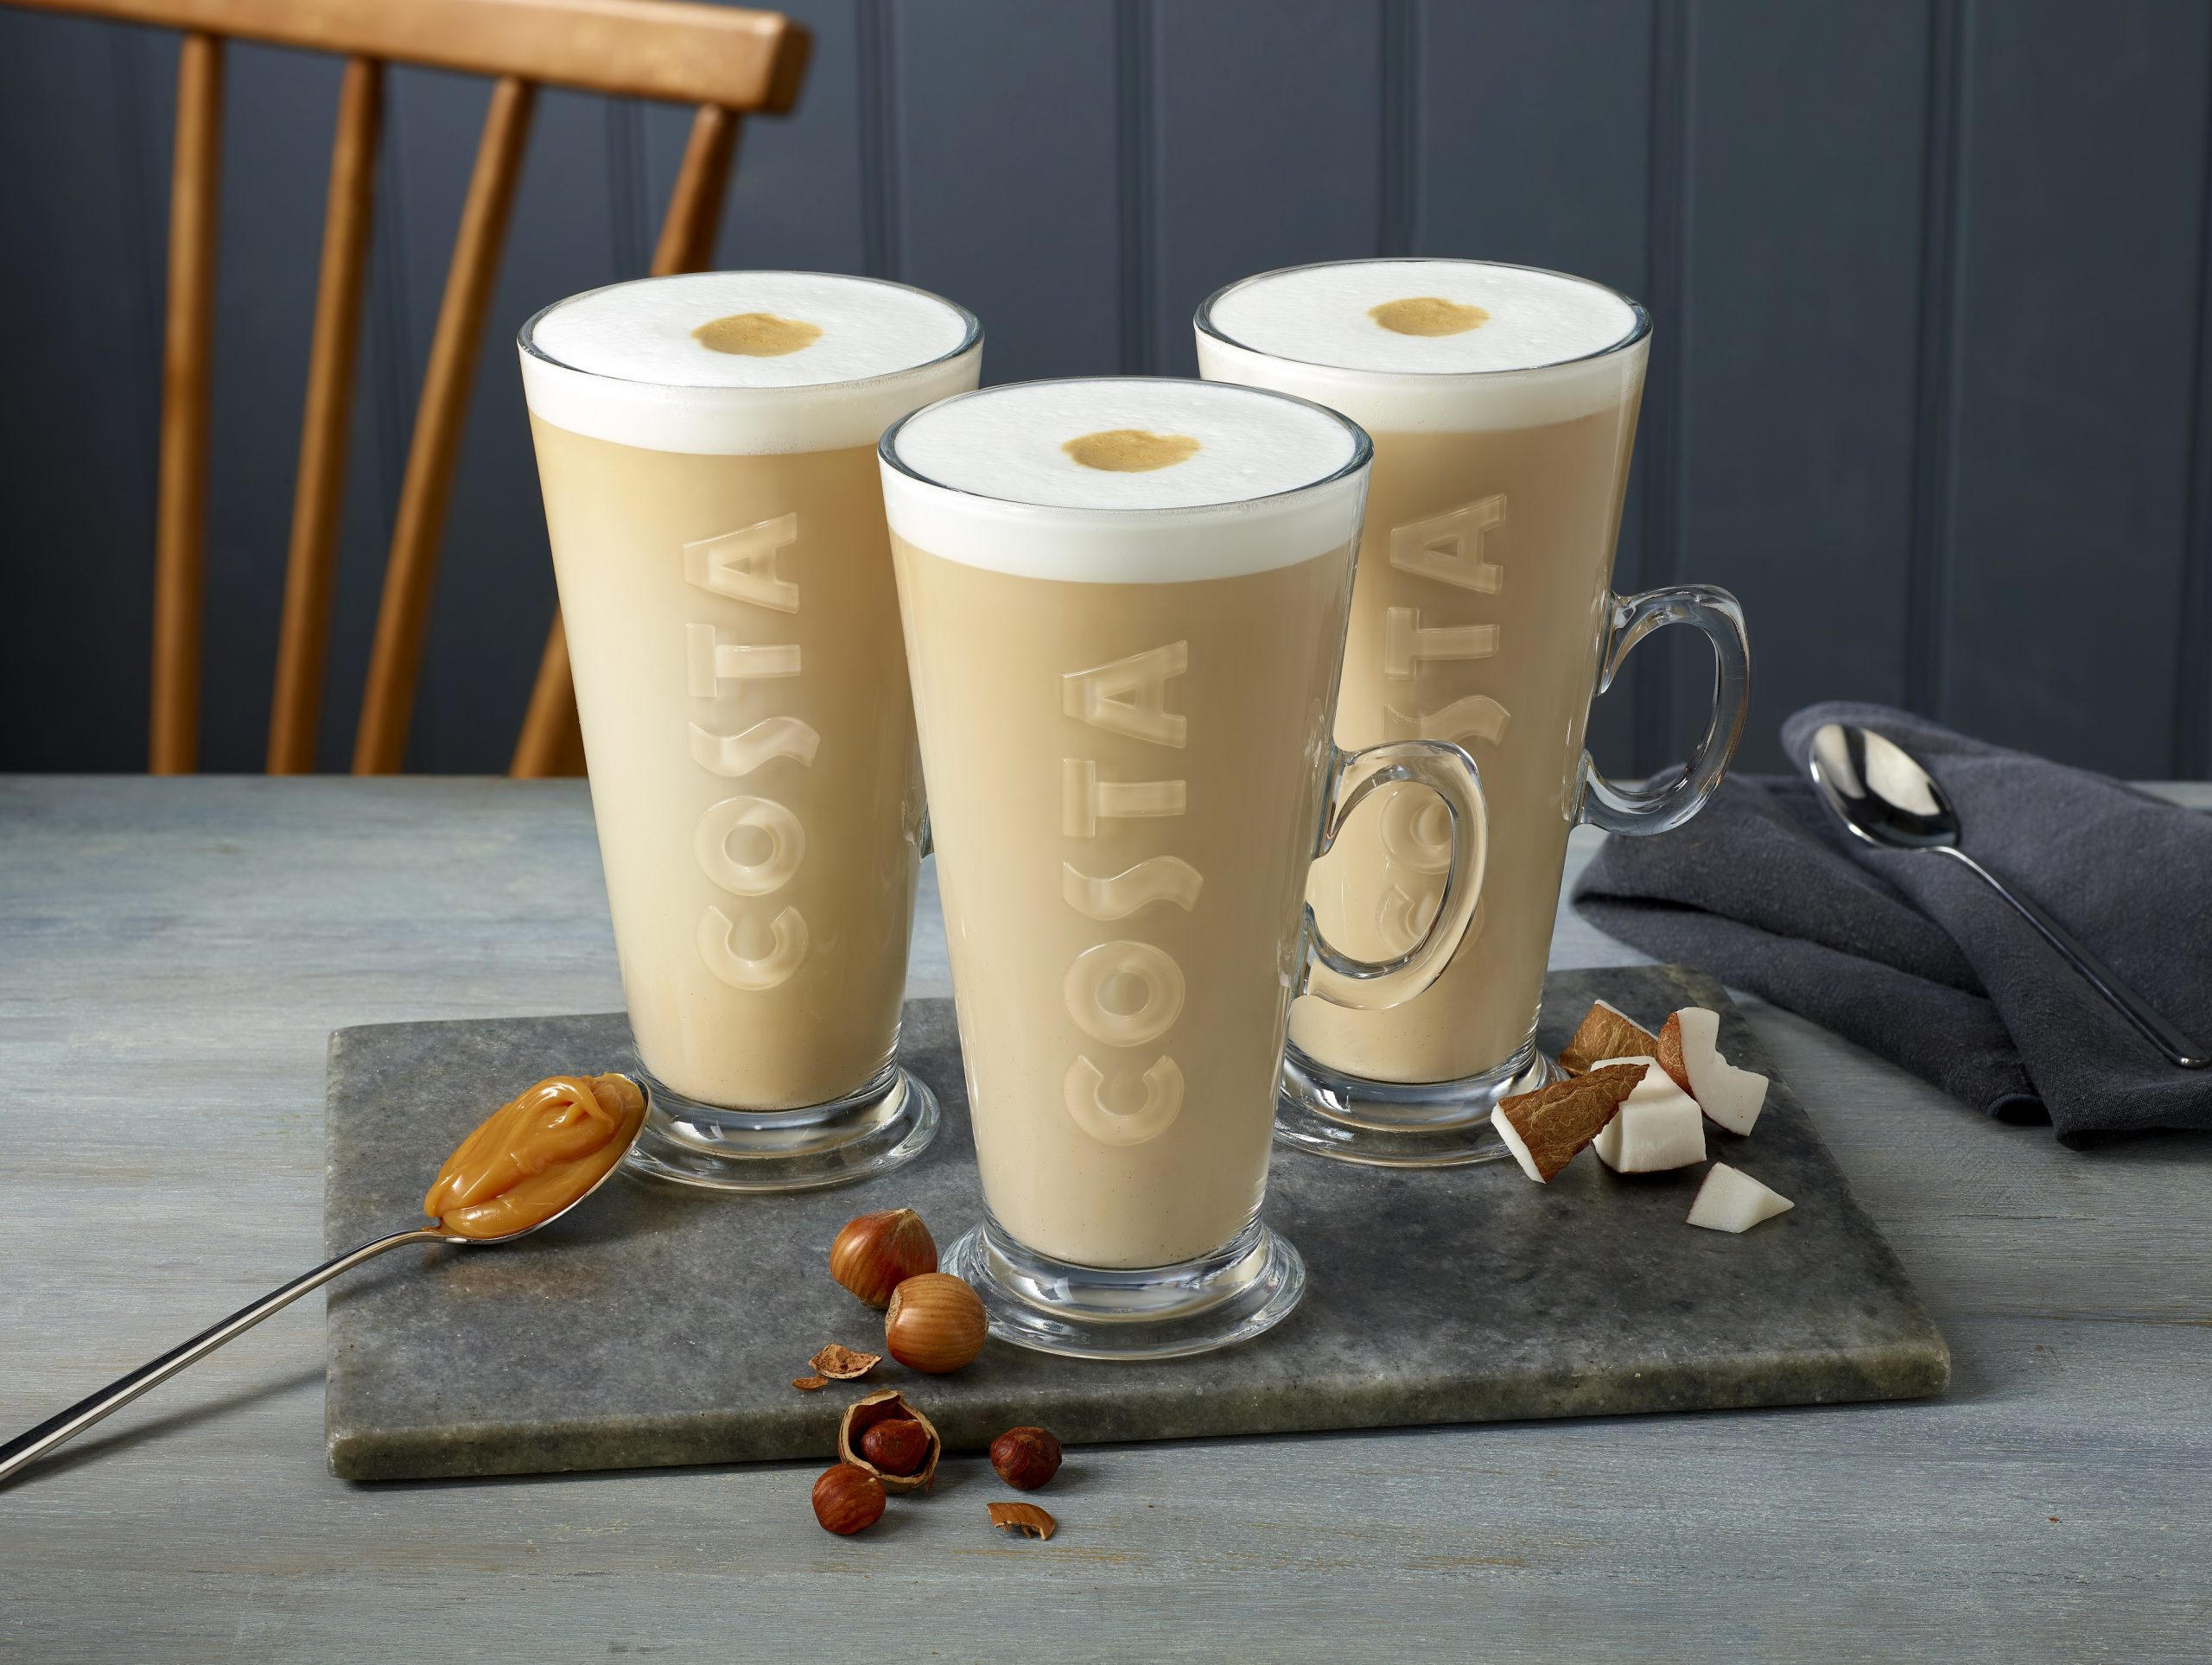 Costa New Latte Range